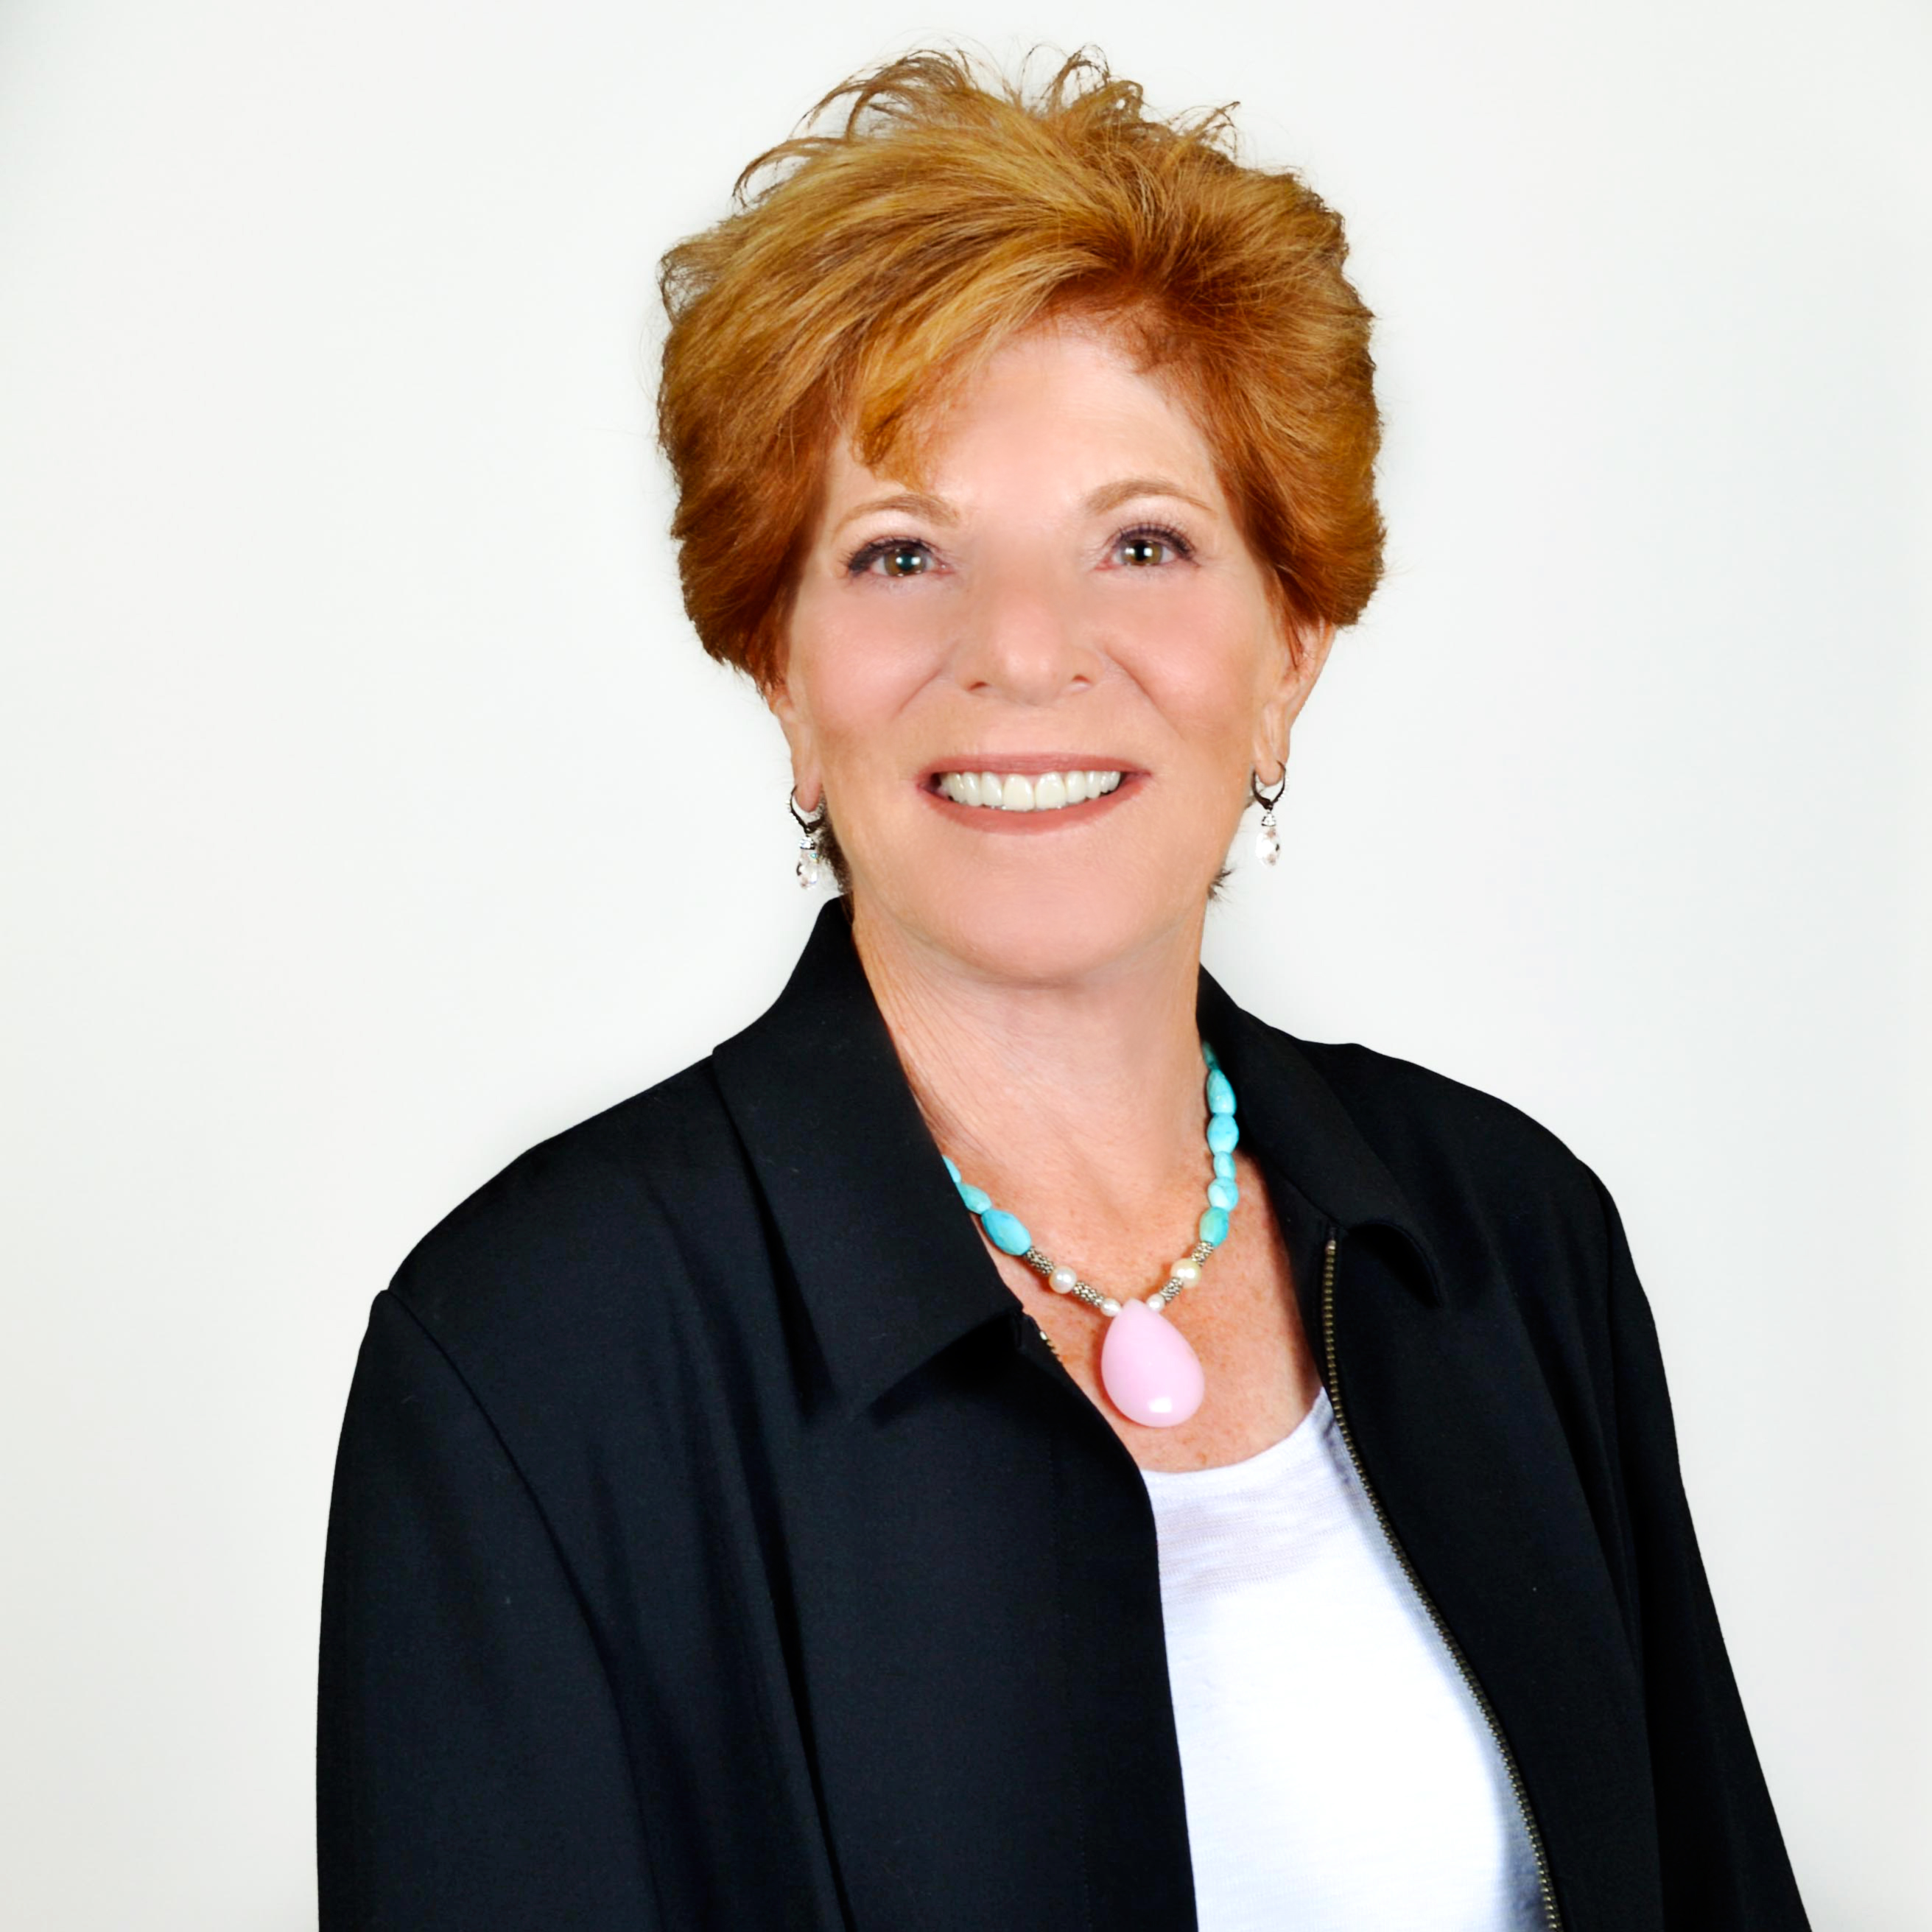 Susan Altbach